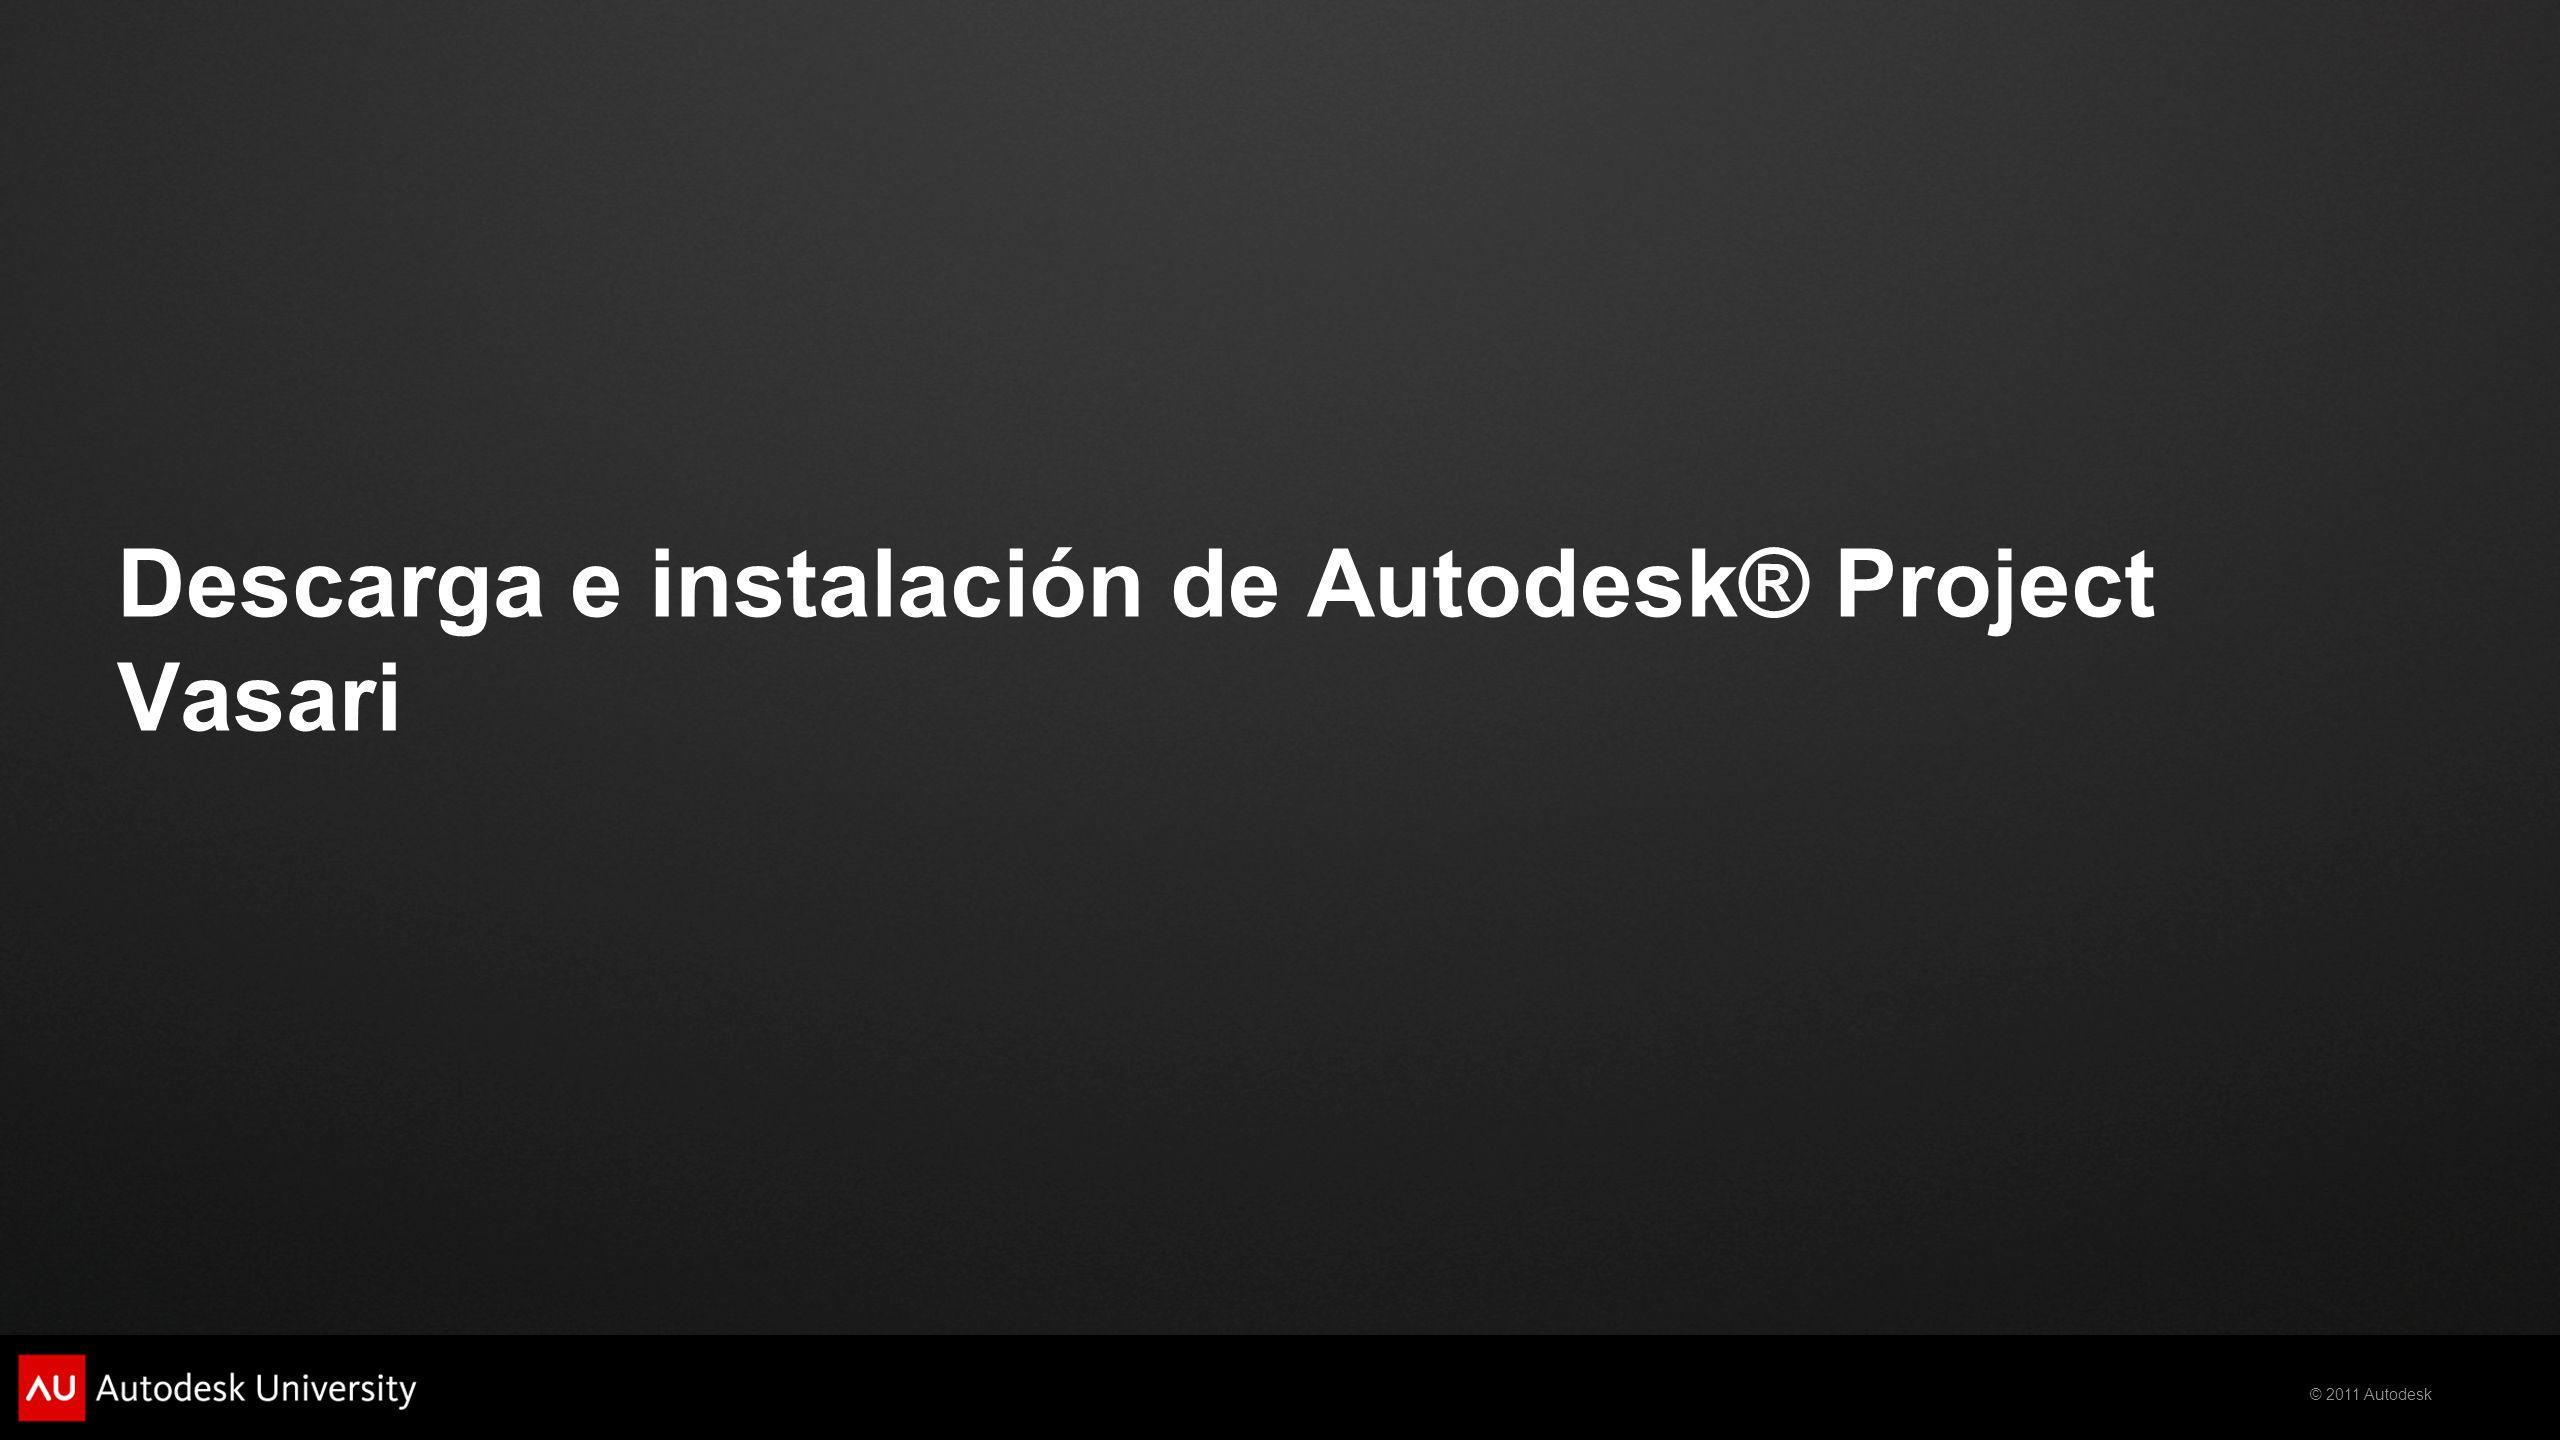 © 2011 Autodesk Interface de trabajo de Autodesk® Project Vasari